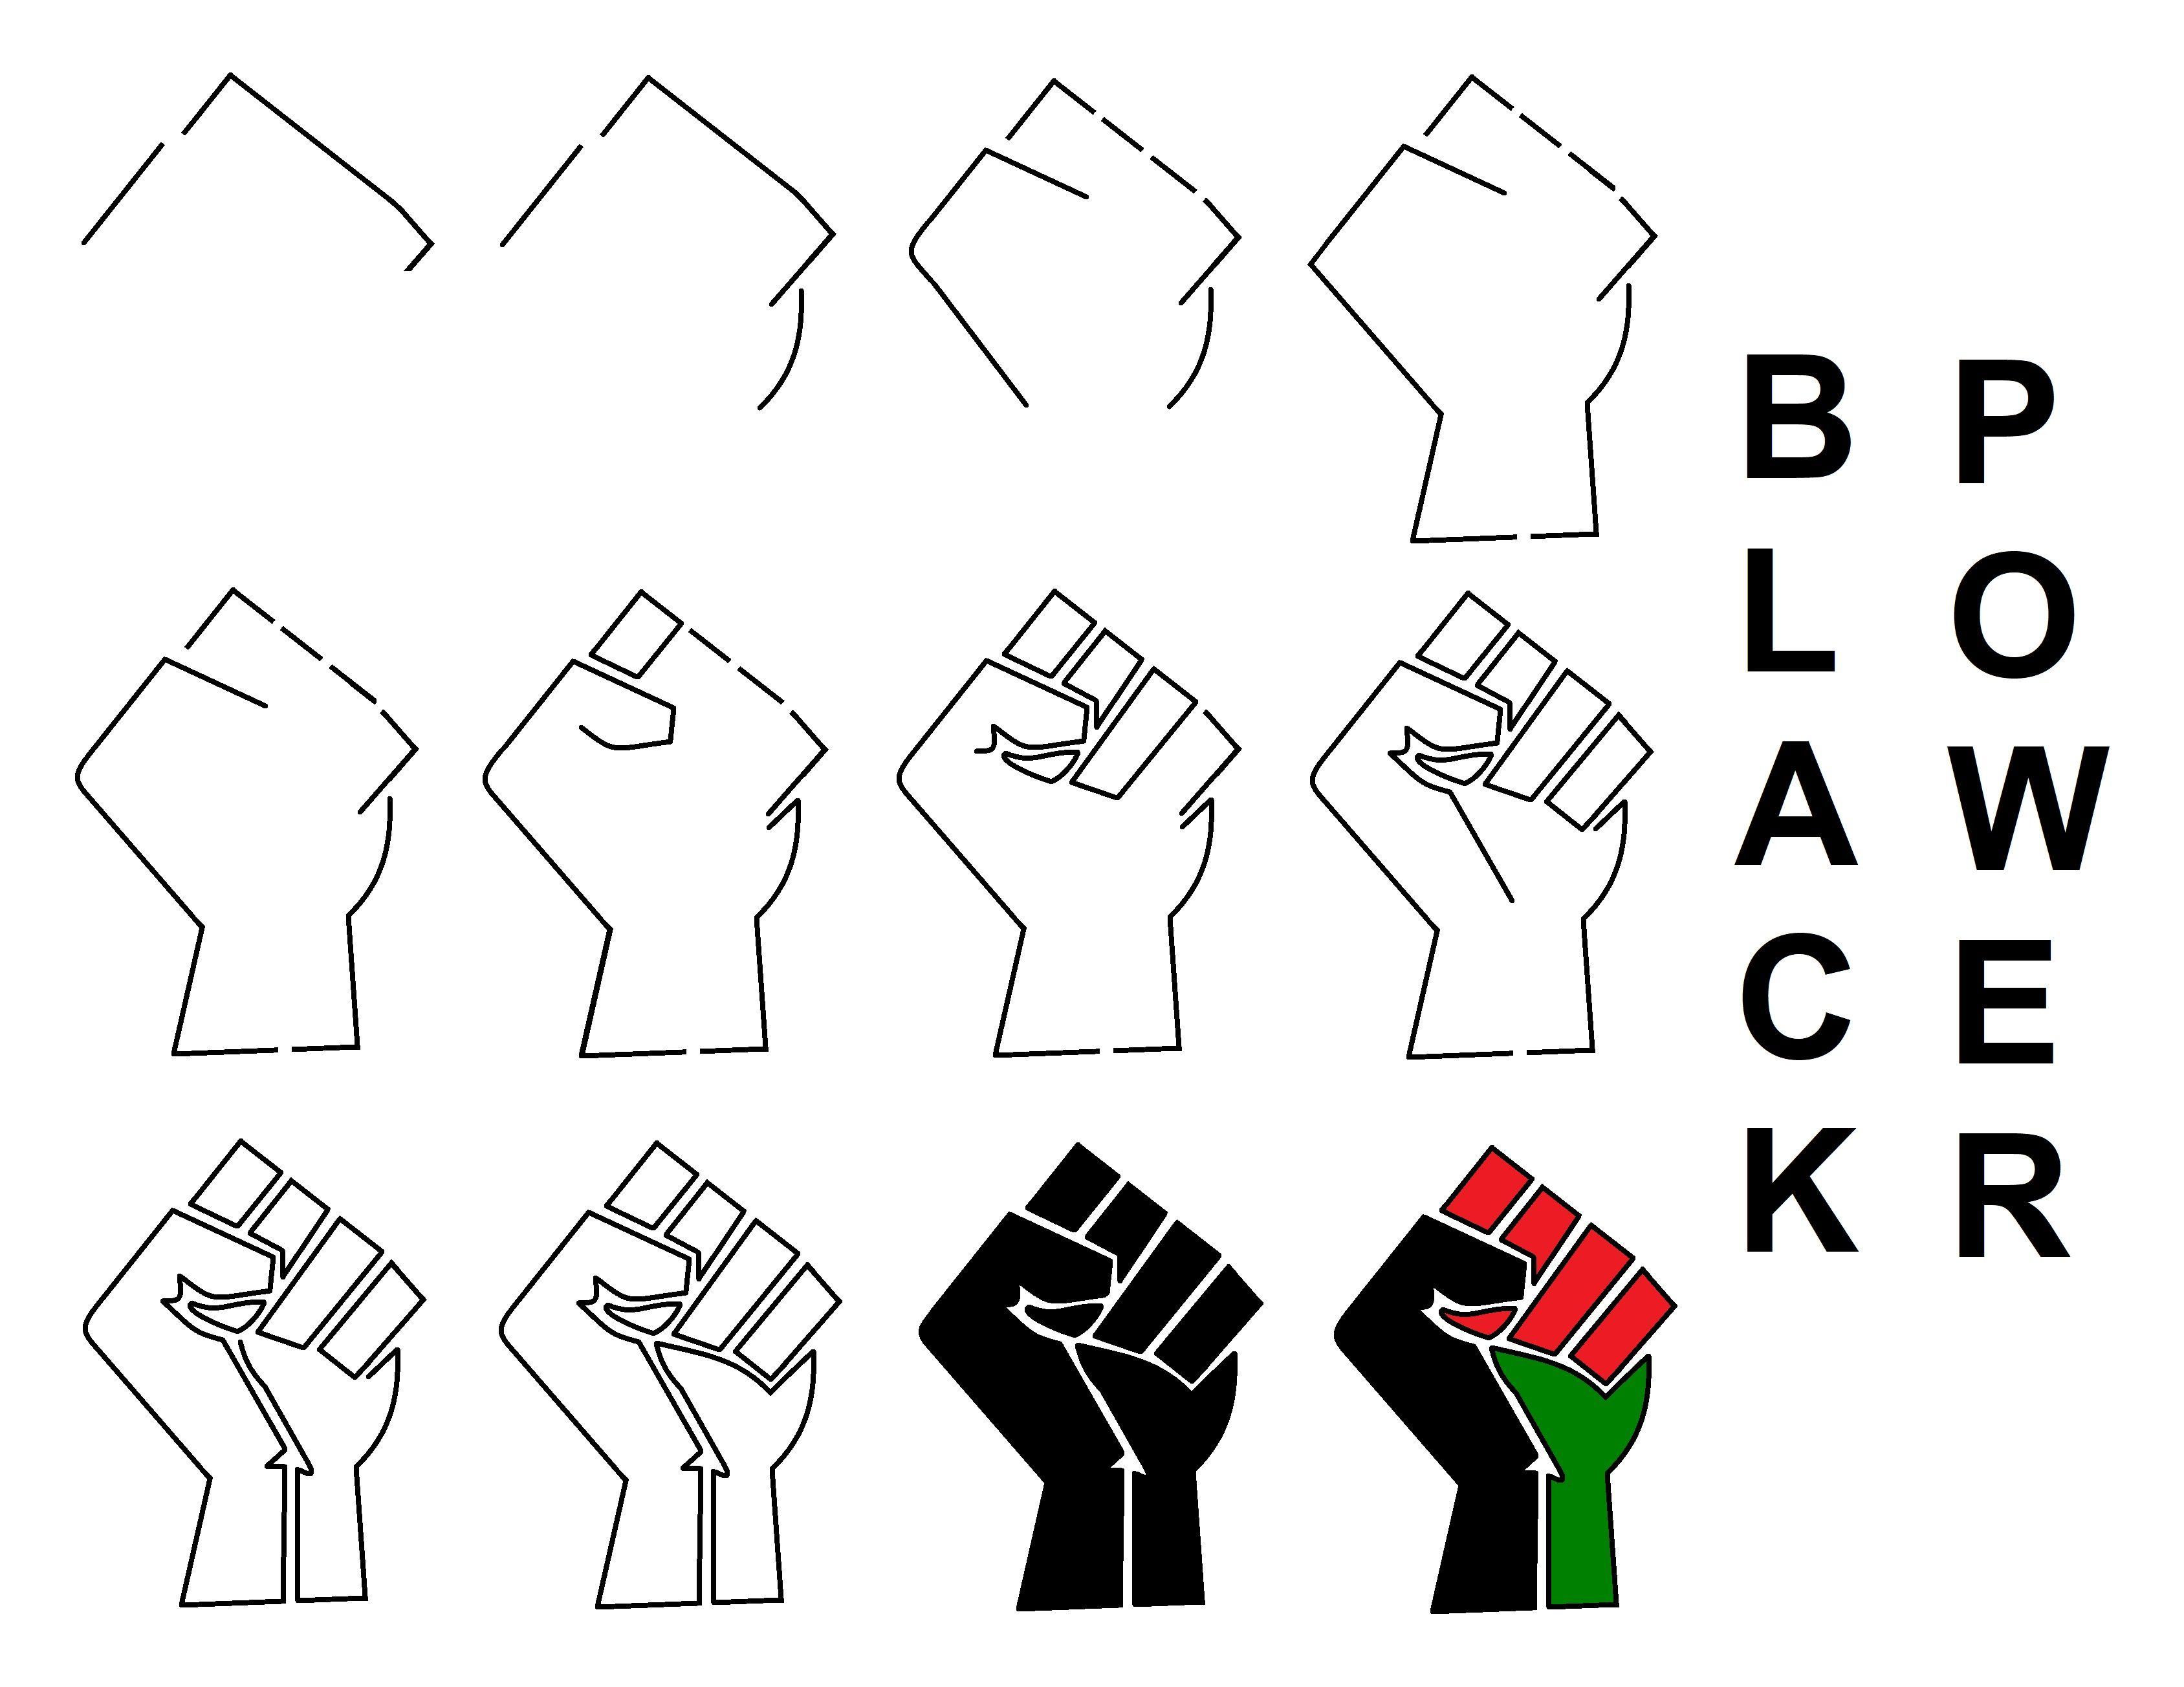 Black Power/Black Lives Matter Fist Logo en 2020